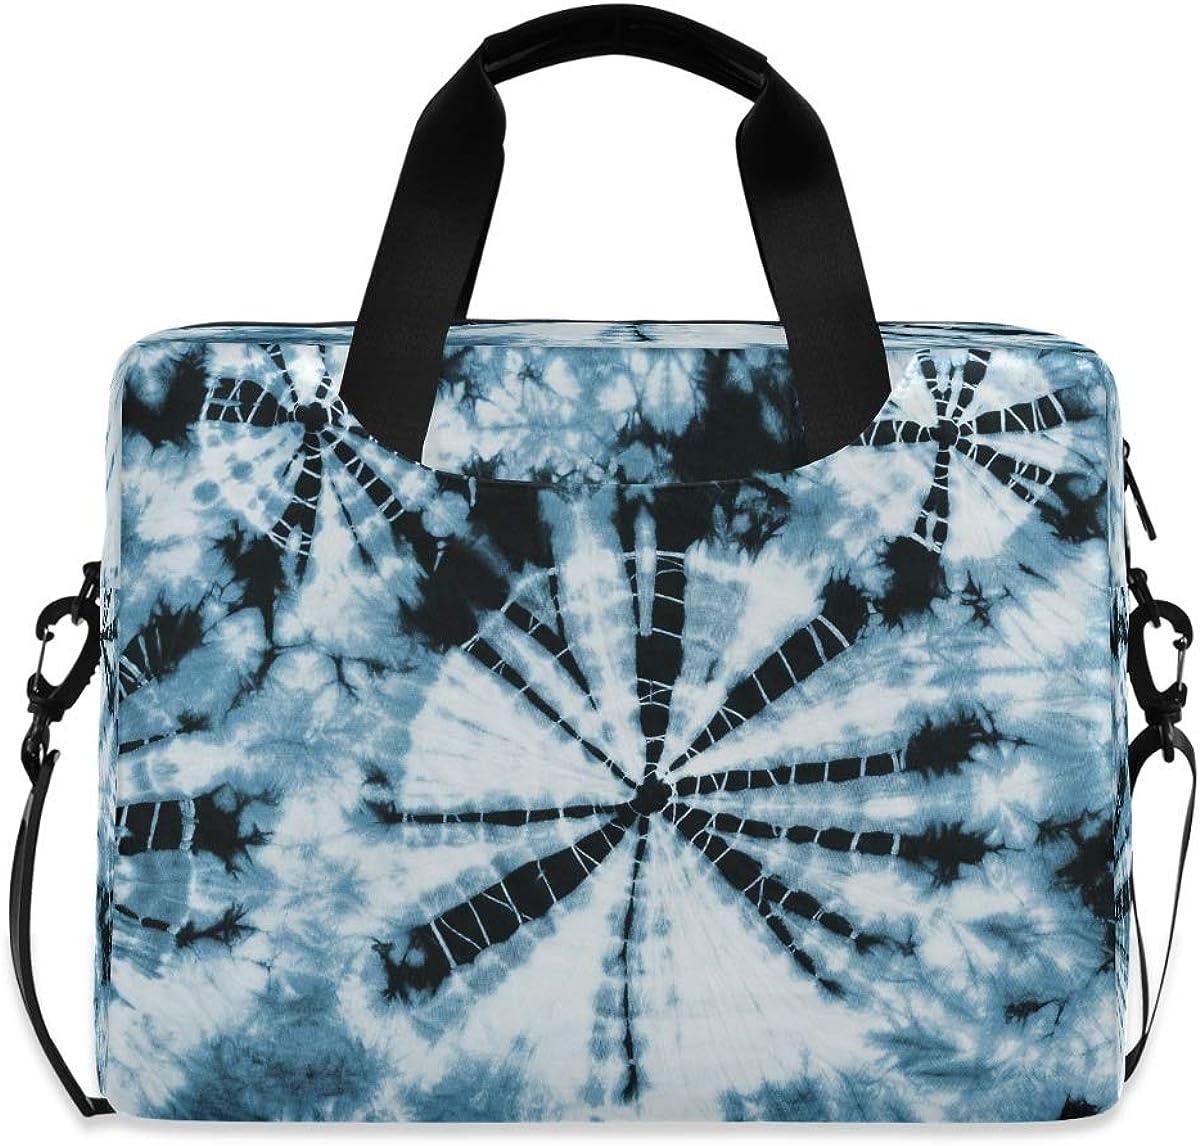 LELEGO Abstract Spasm price Tie Dye Pattern C Shoulder Laptop Bag 2021new shipping free shipping